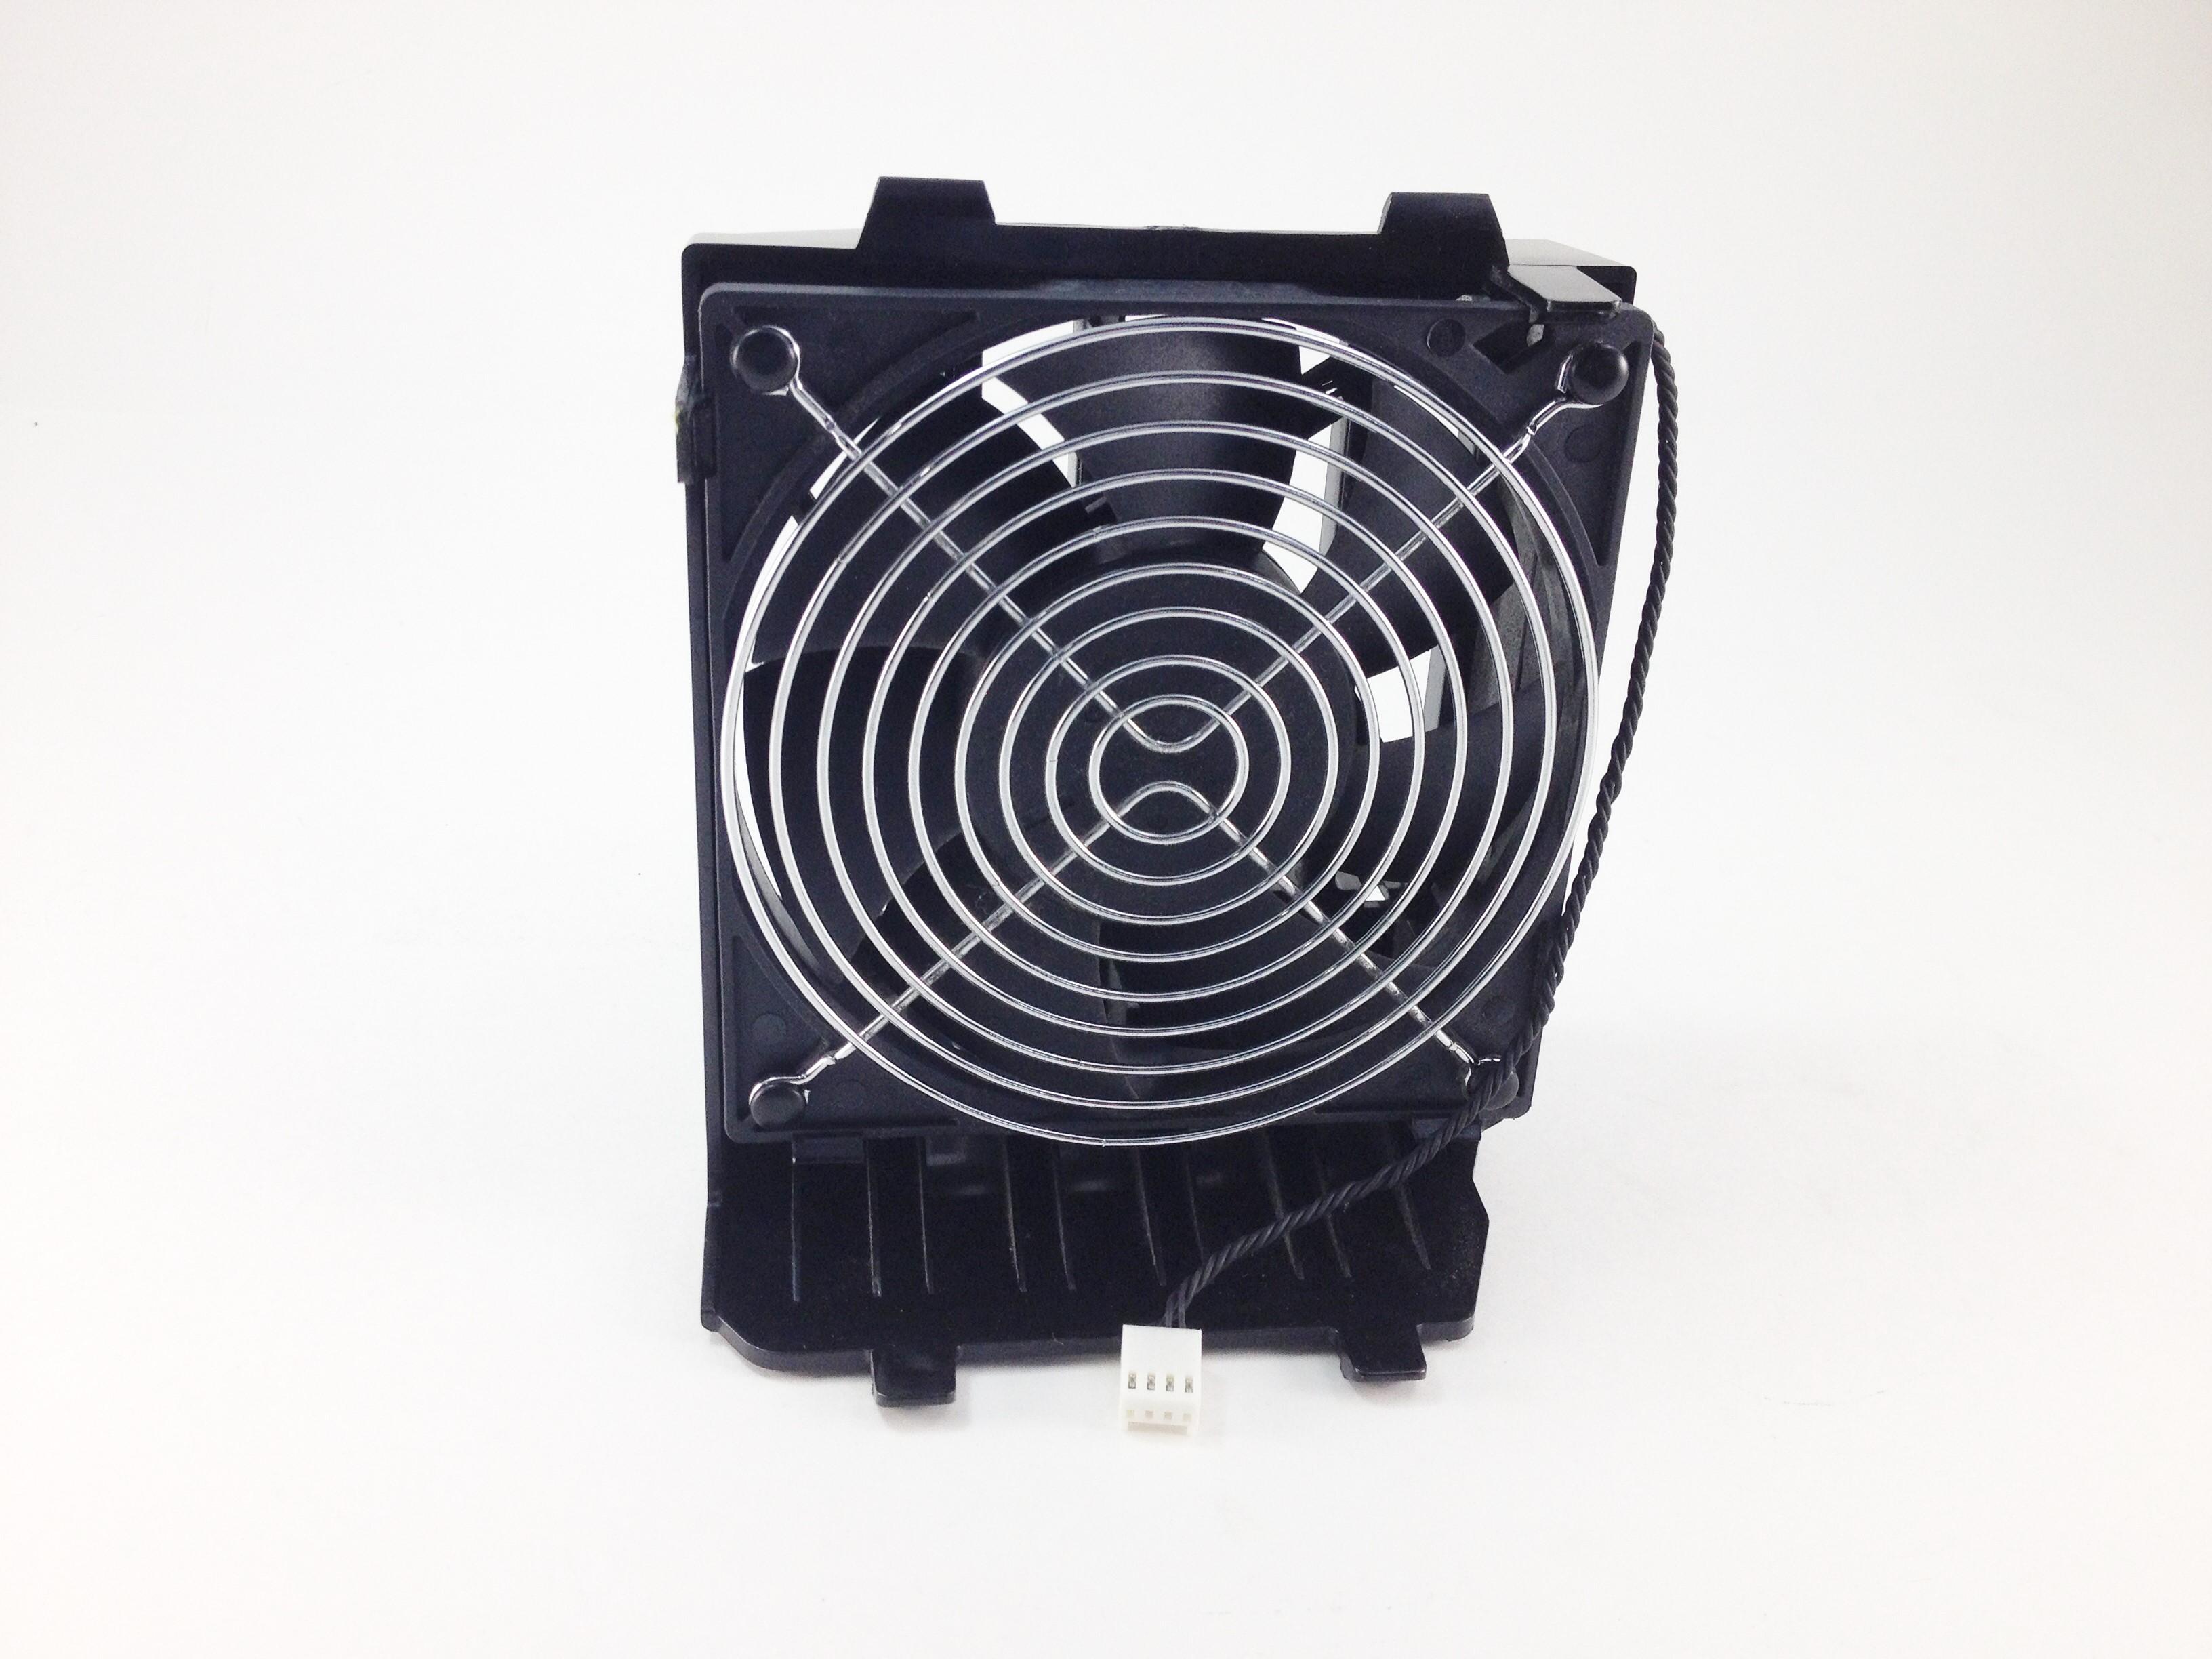 644319-001 HP Z620 Front Fan Assembly